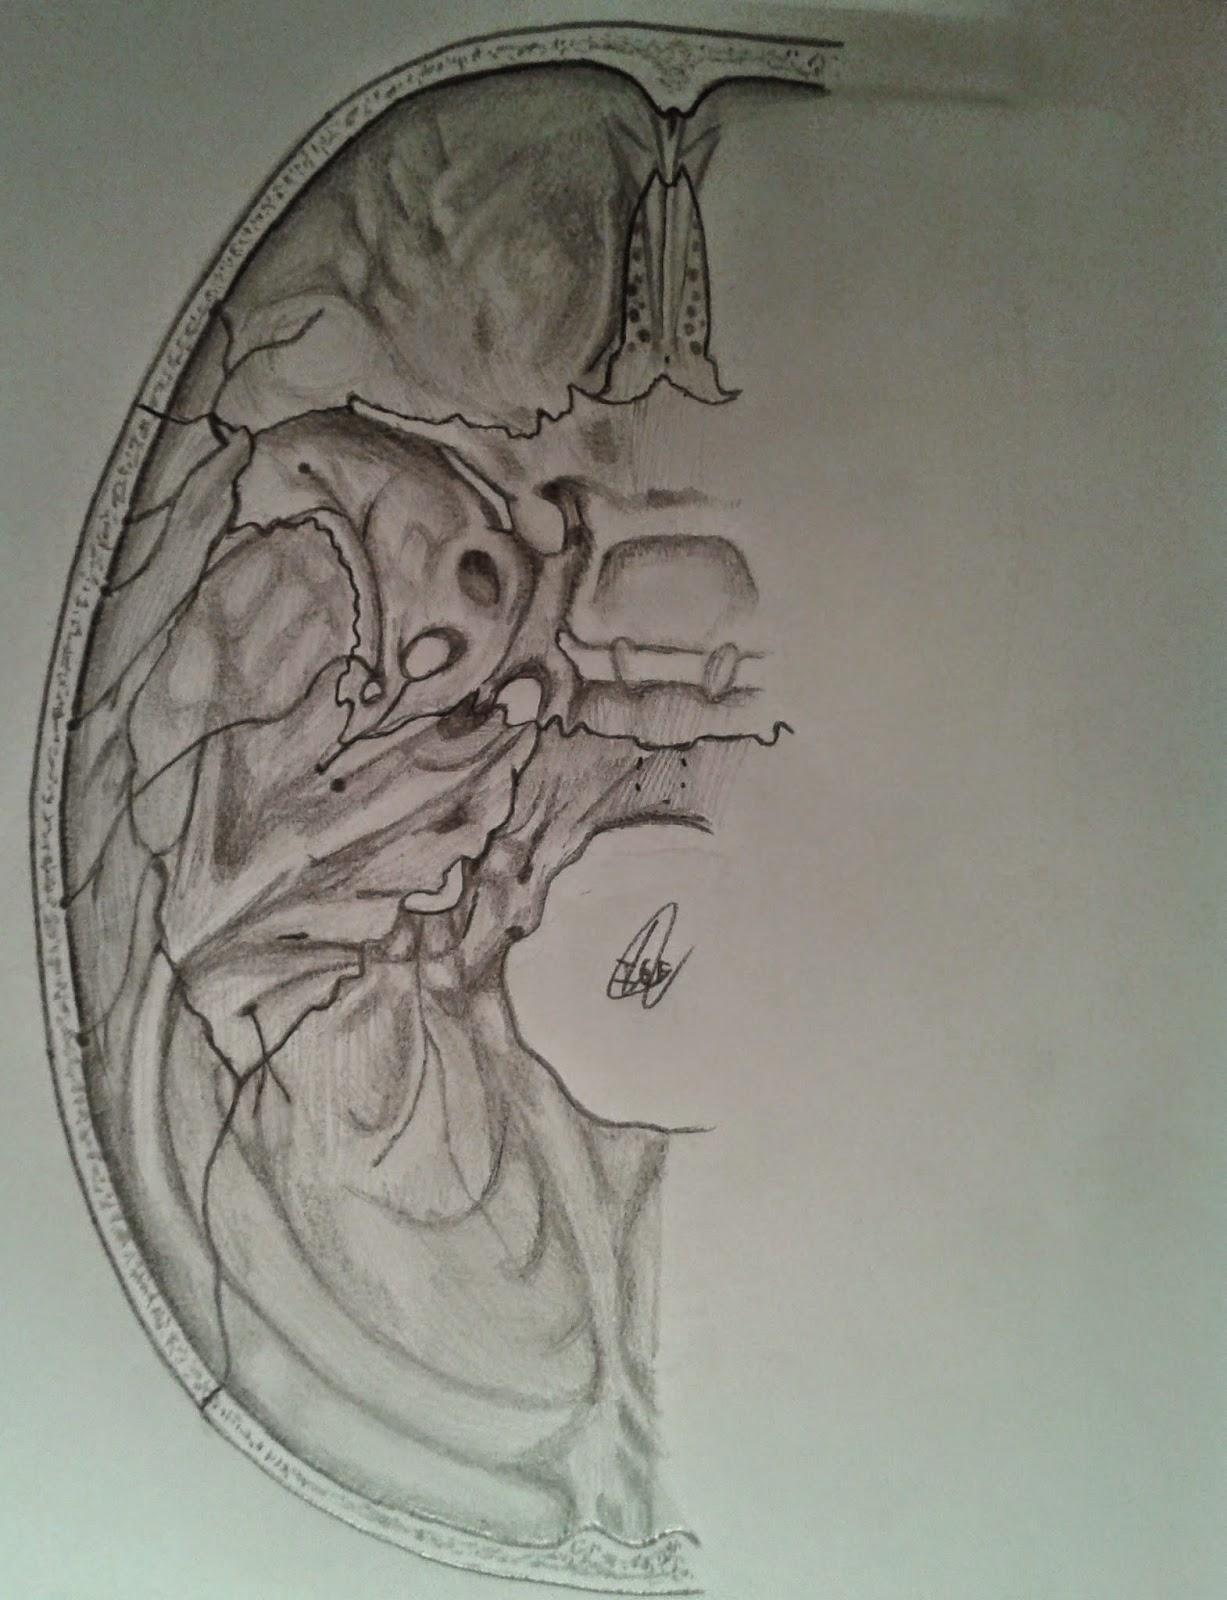 Gantxegi\'s Anatomy: Huesos de la base del cráneo: vista superior